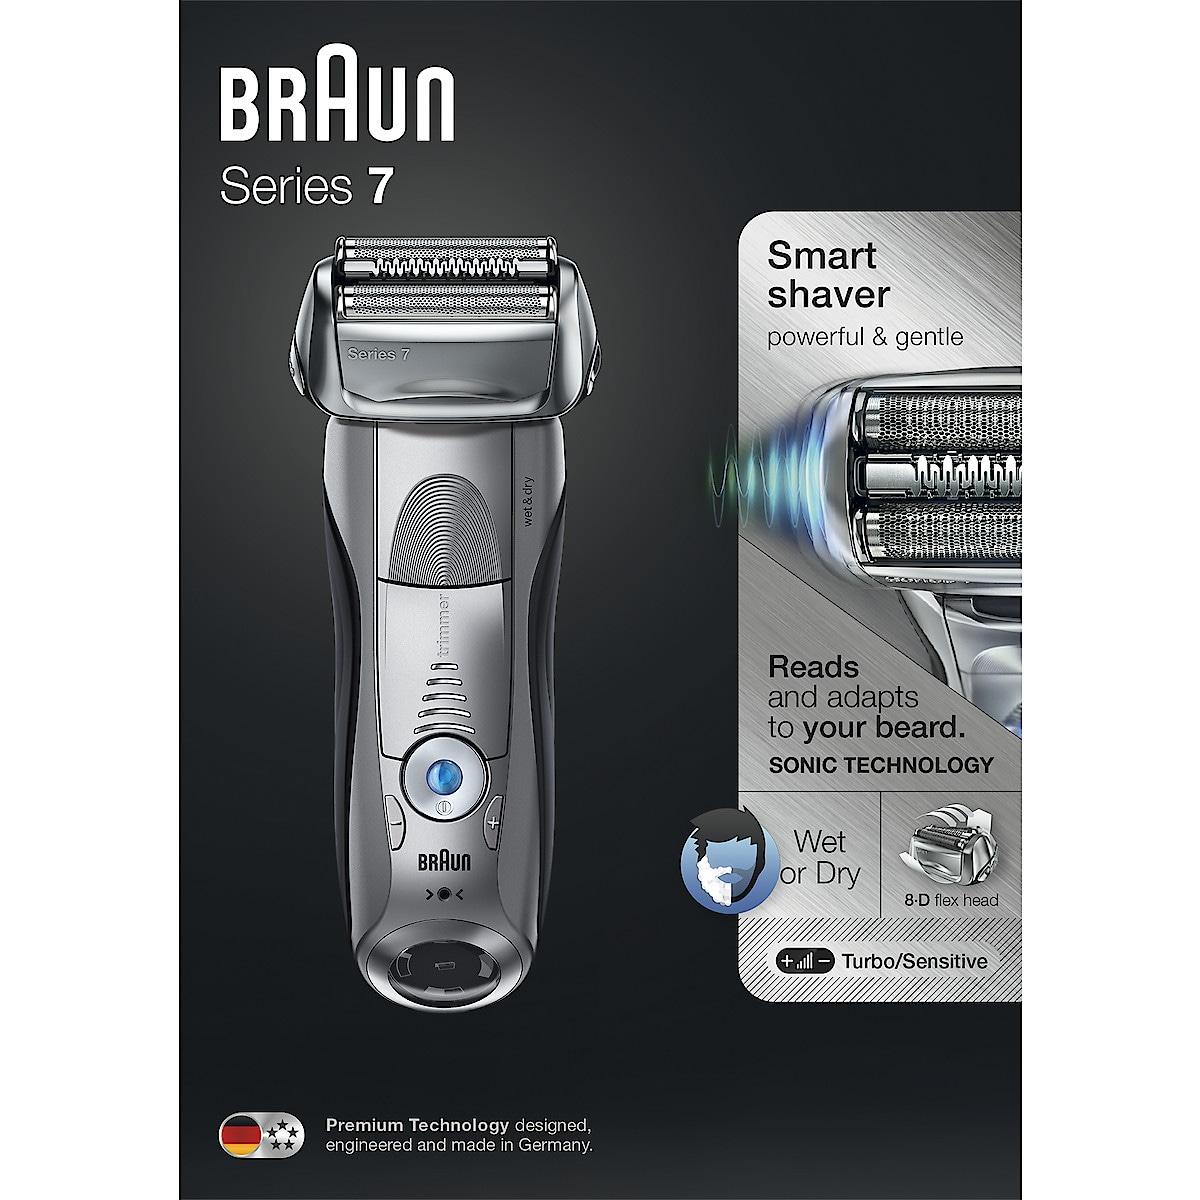 Partakone Braun Series 7 7893s Wet & Dry